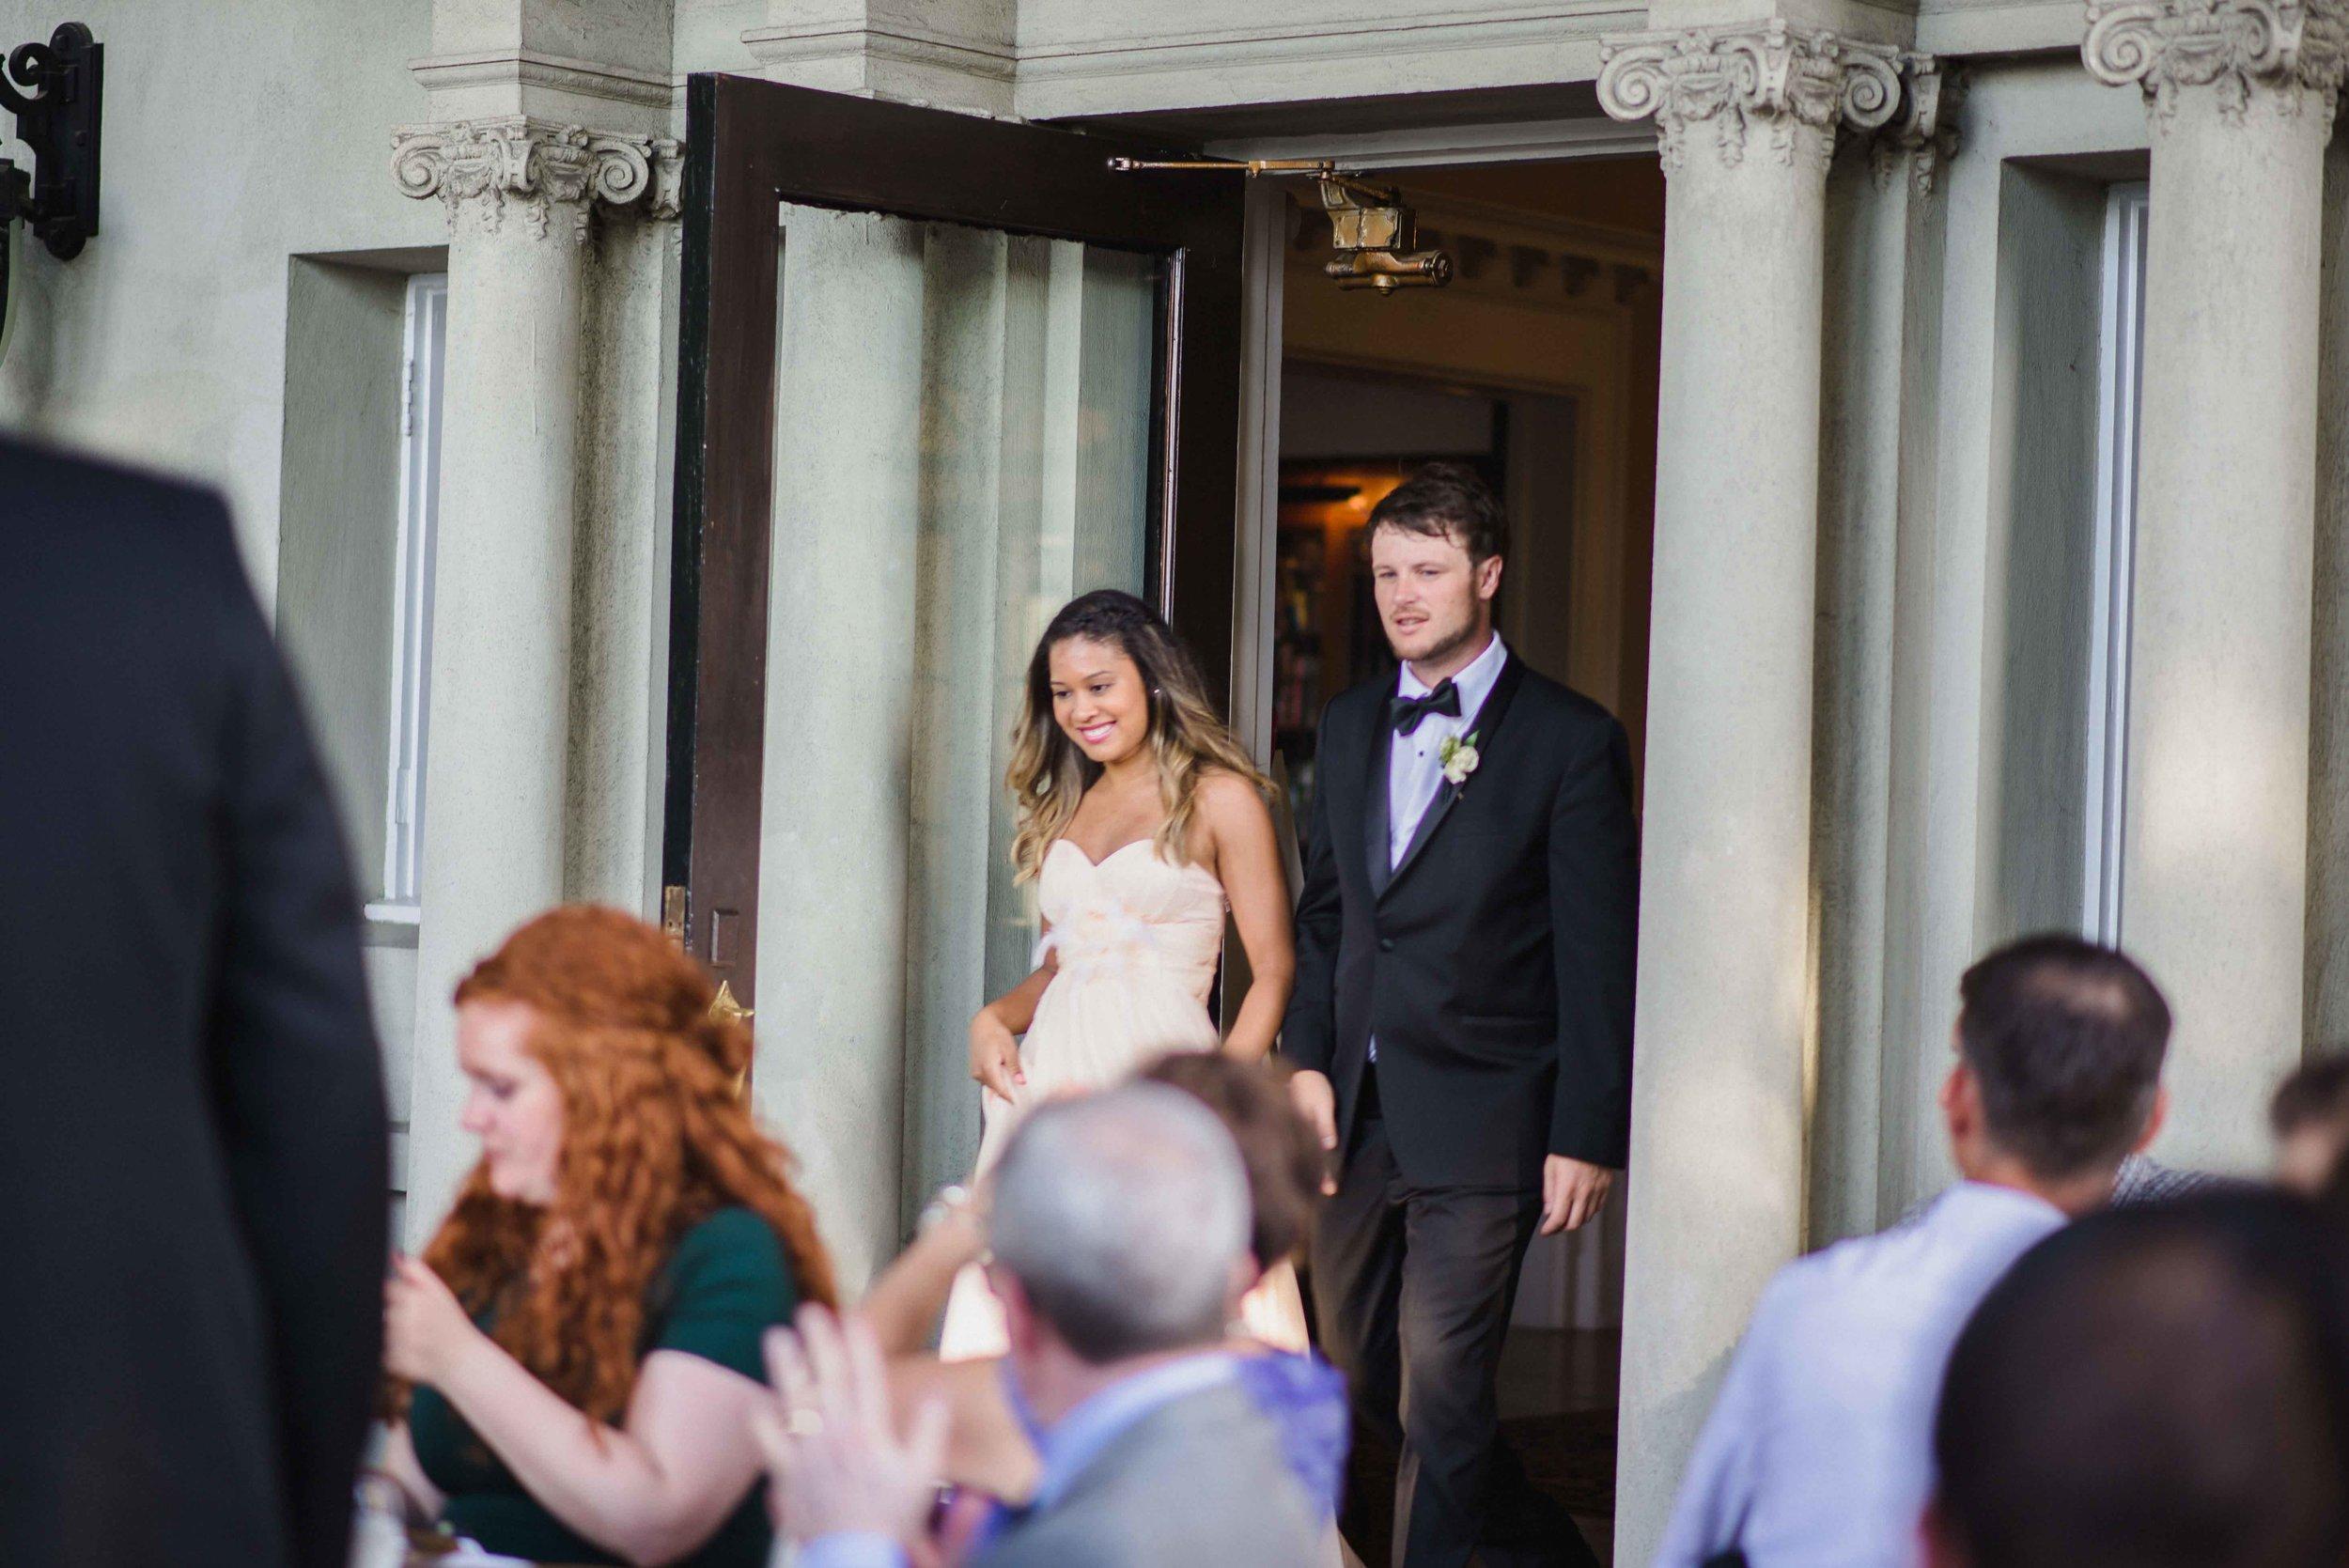 vancouver-hycroft-wedding-photographer-edward-lai-photography-10.jpg